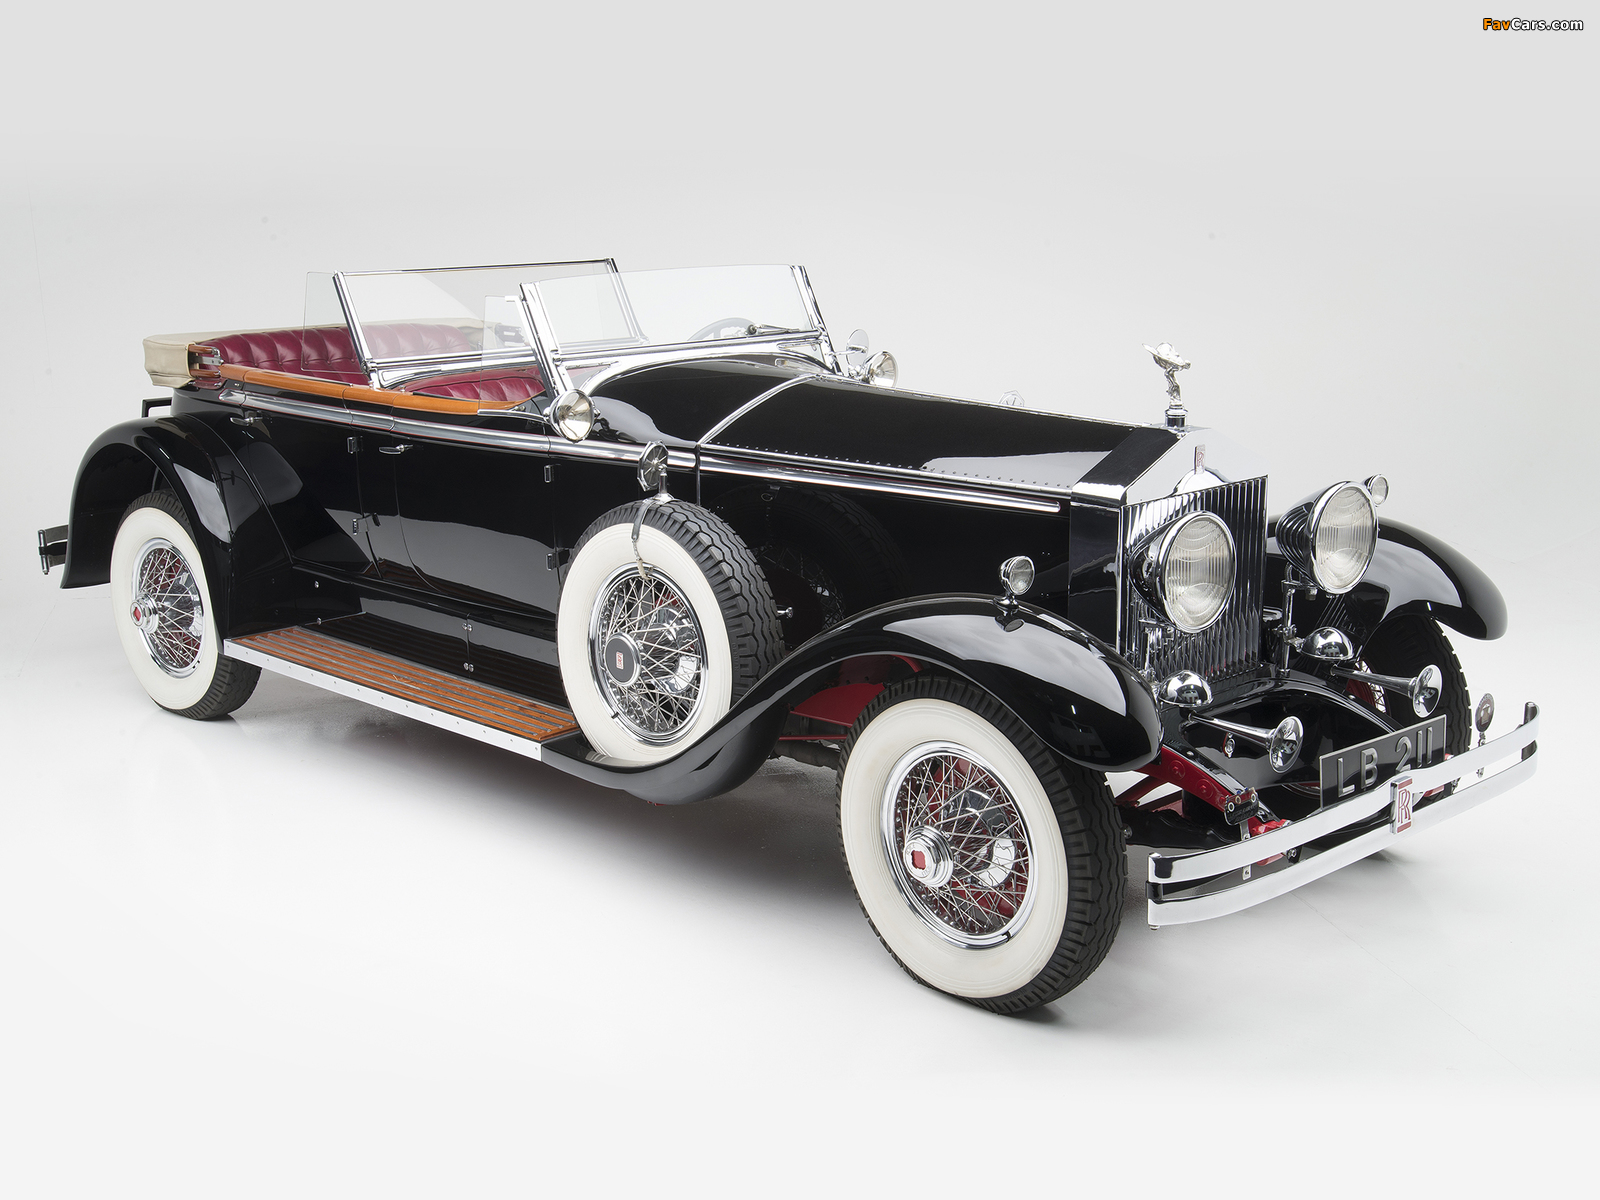 Rolls-Royce Springfield Phantom I Ascot Phaeton by Brewster (S308LR-7169) 1929 pictures (1600 x 1200)